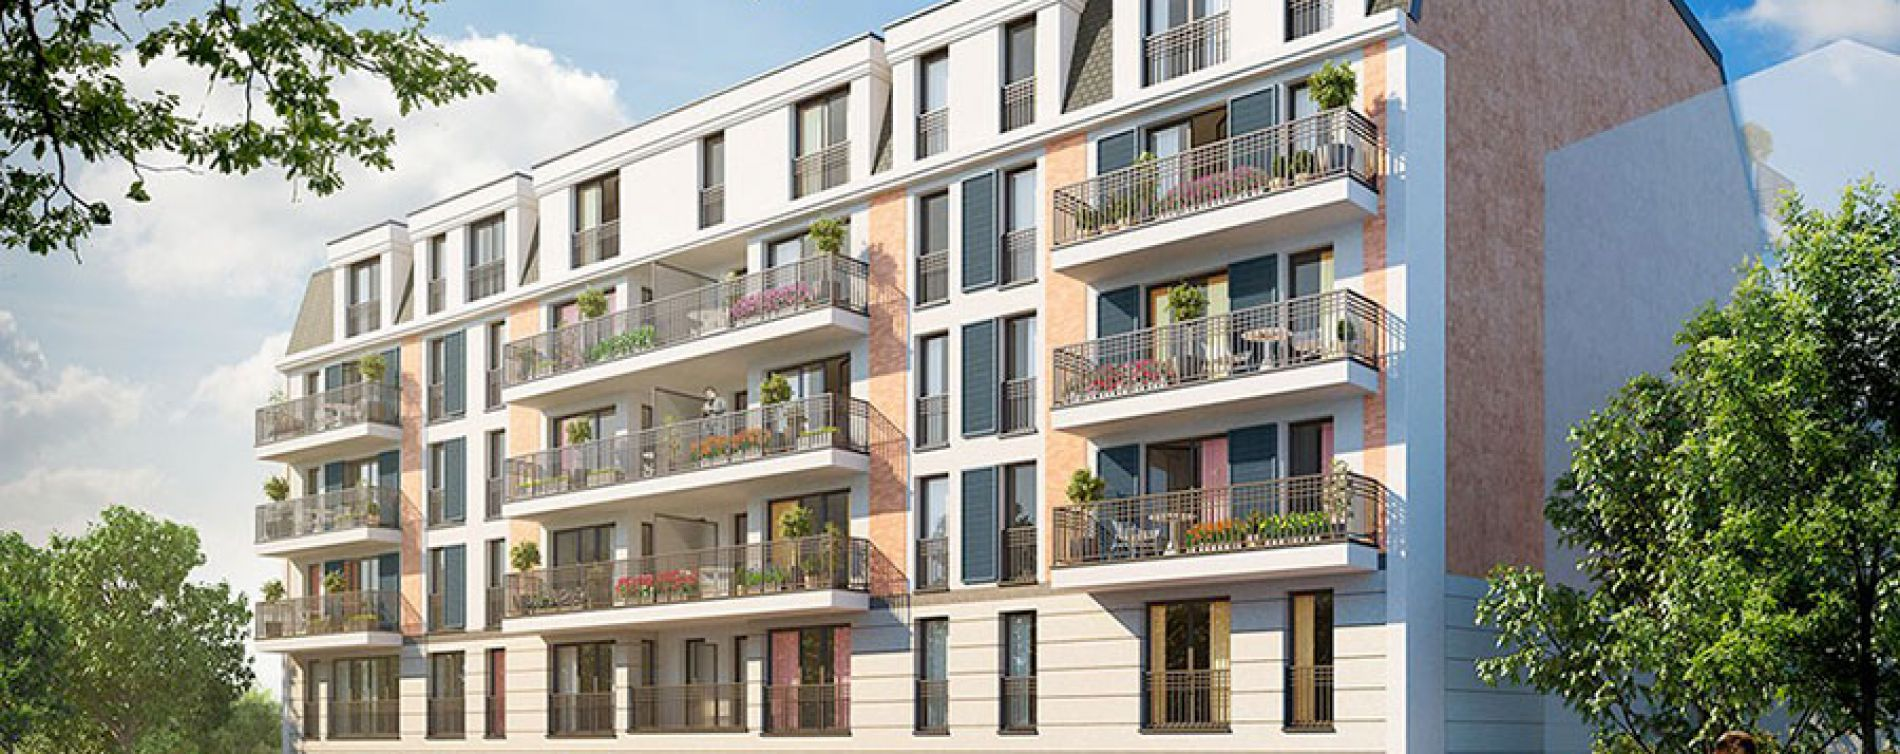 Saint-Maurice : programme immobilier neuve « Panoramiq' » (2)